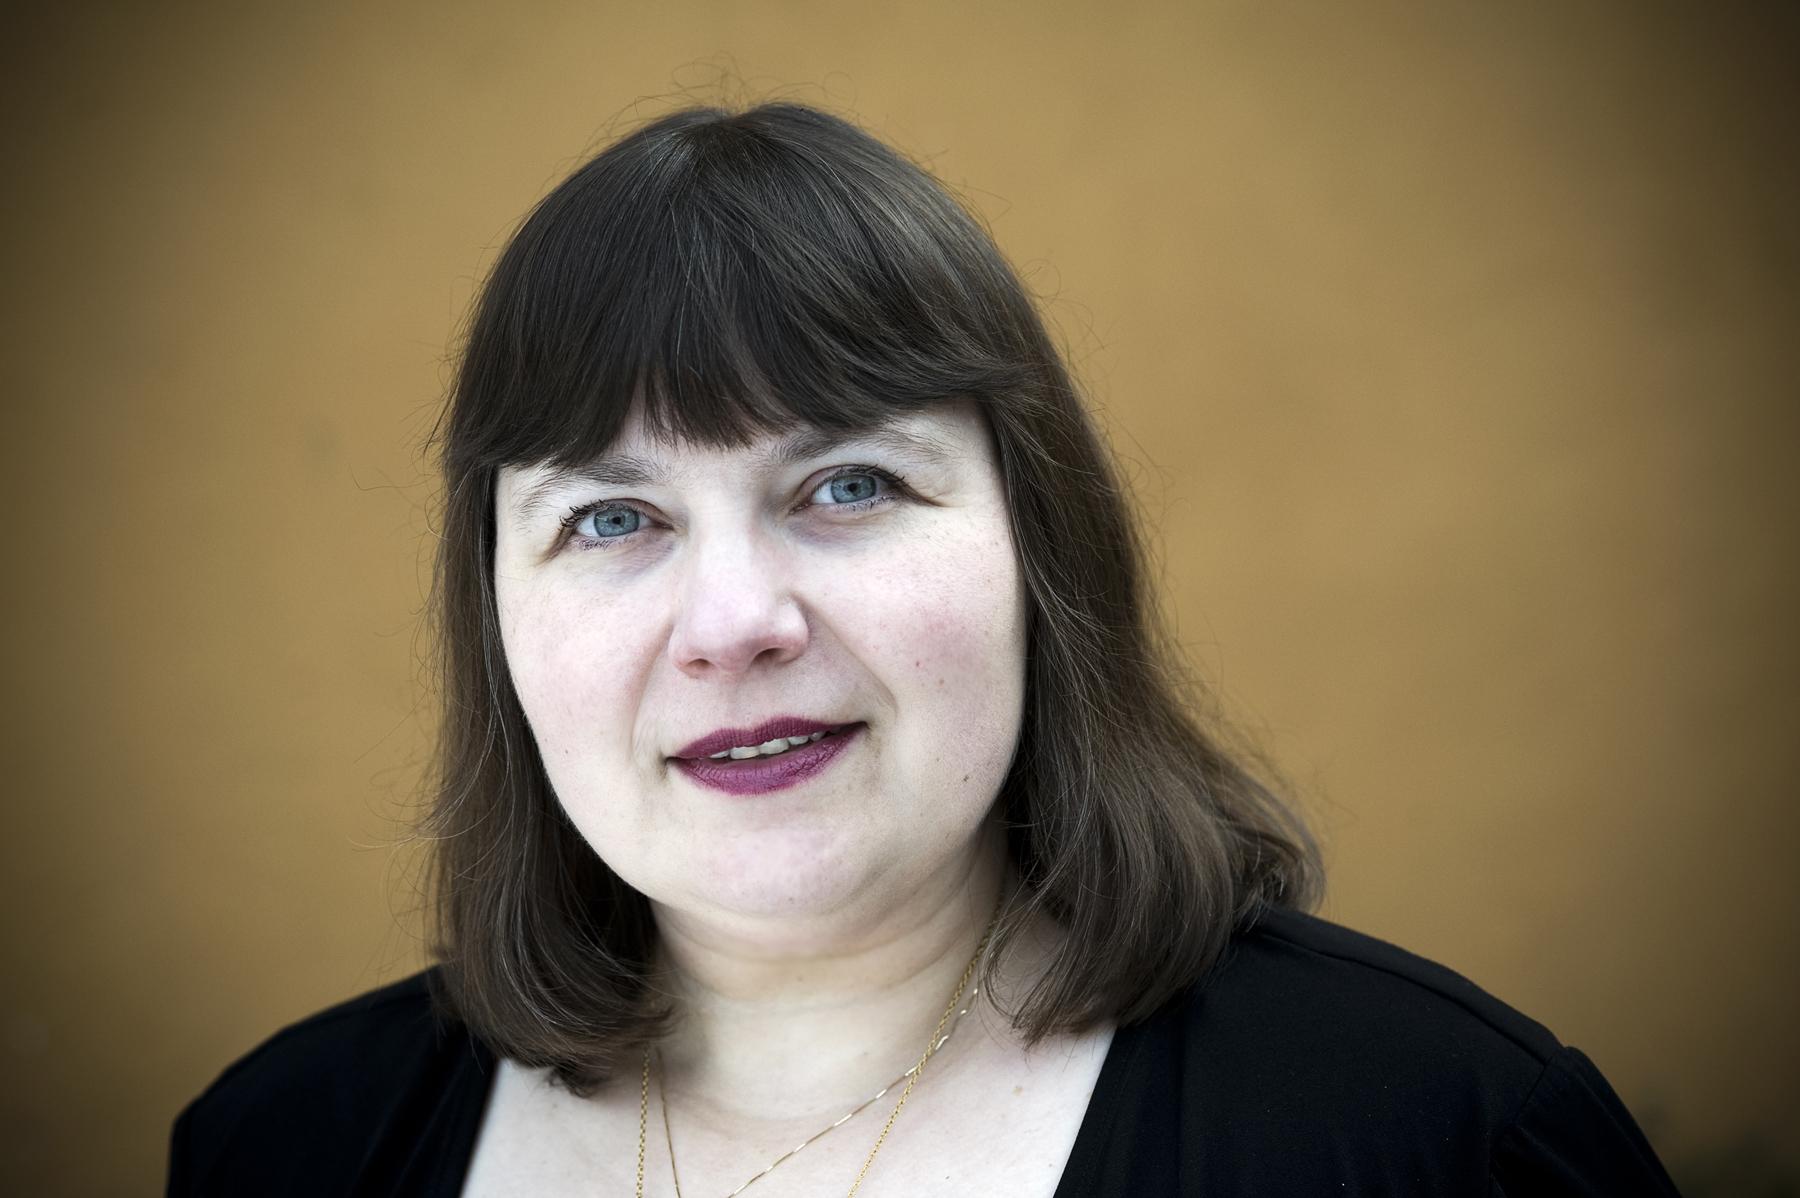 Yelena Eckemoff